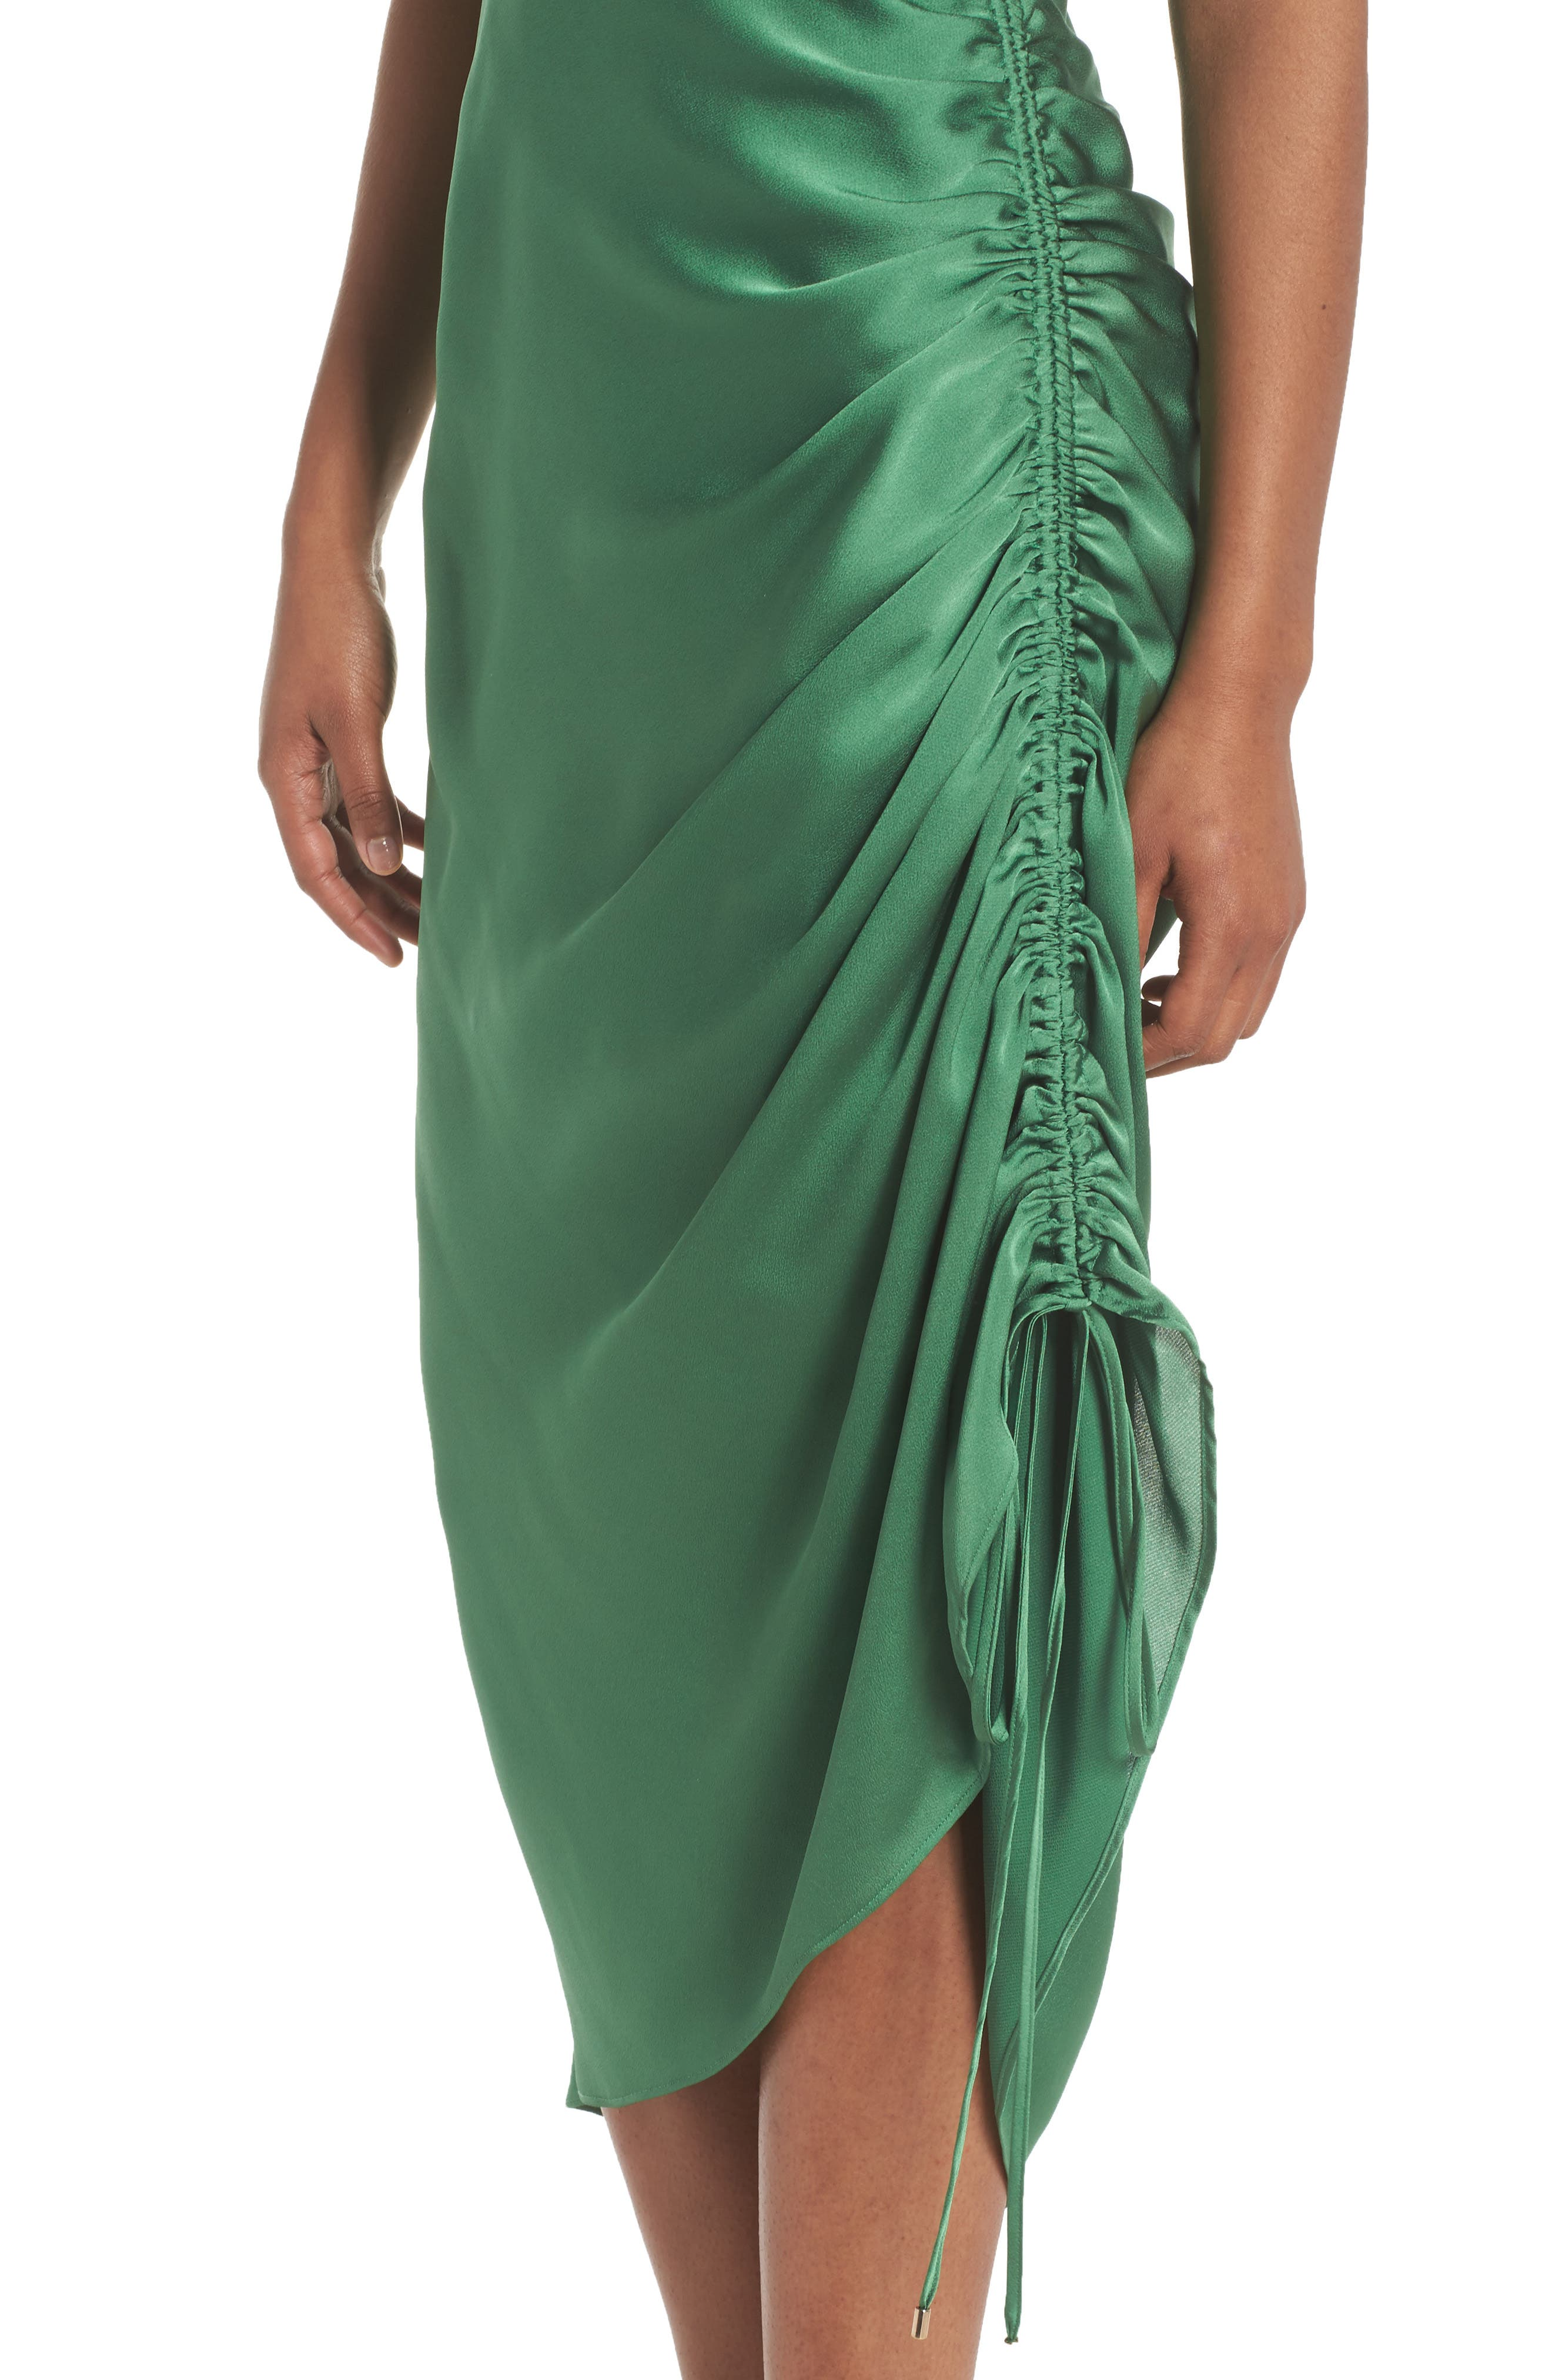 I've Got You Asymmetrical Satin Dress,                             Alternate thumbnail 4, color,                             310